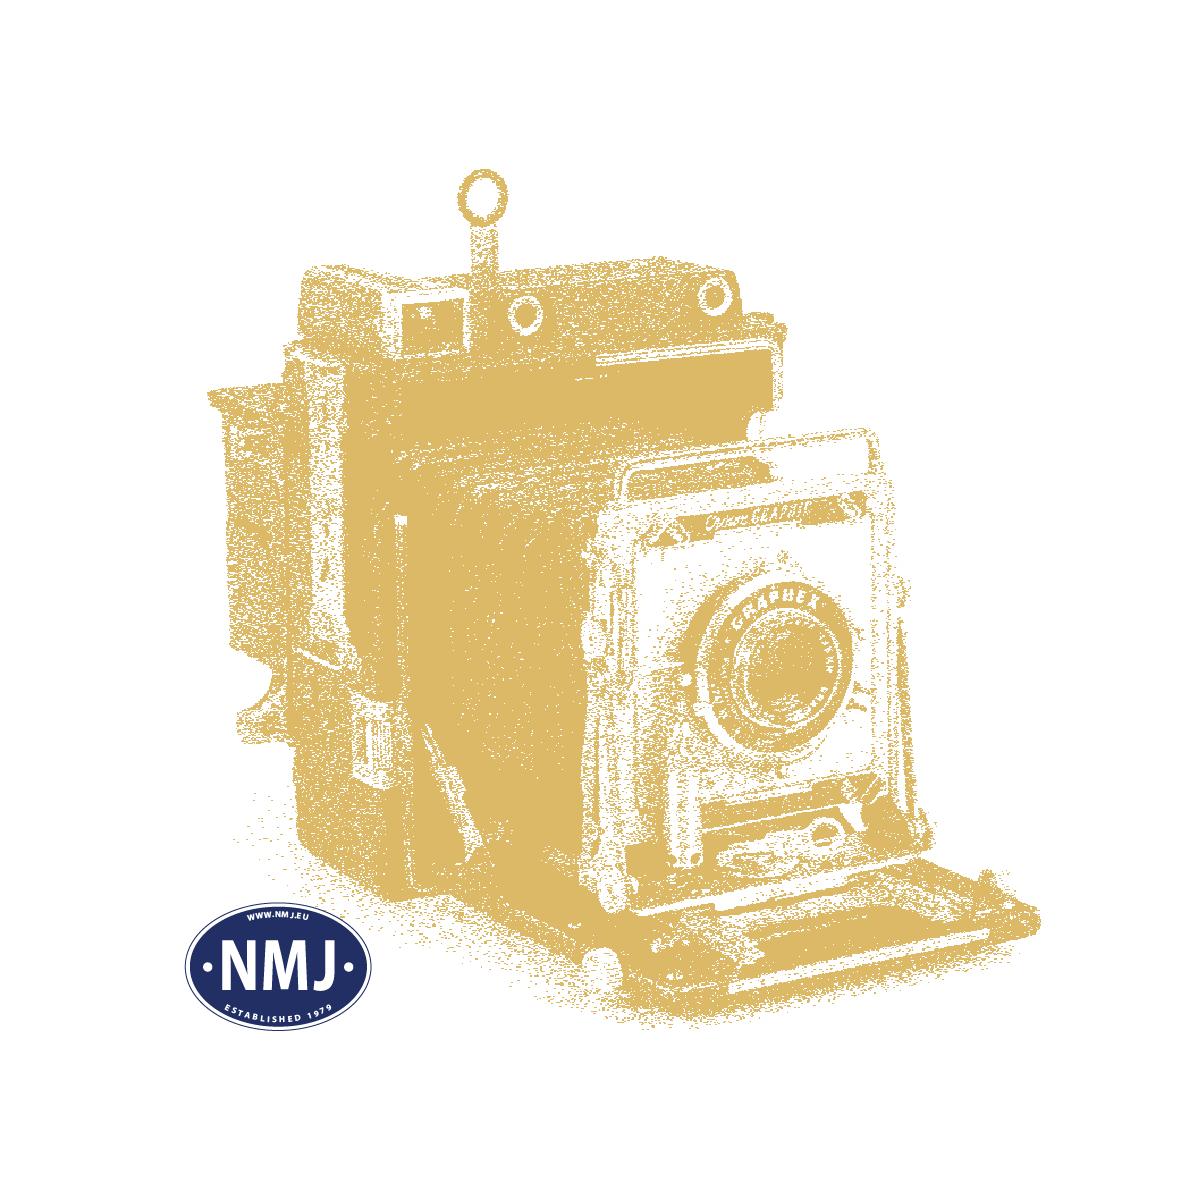 TOM03100101 - Testrigg / Rullebukk, AC/DC, Utvidbar